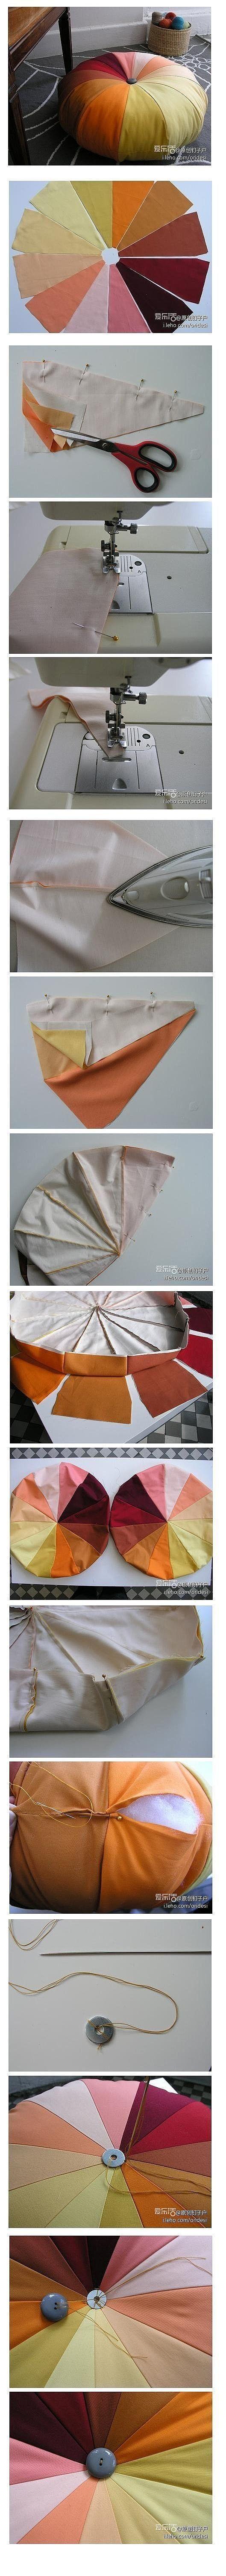 DIY cute cushion - to make a pumpkin cushion   http://www.normandeauwc.com